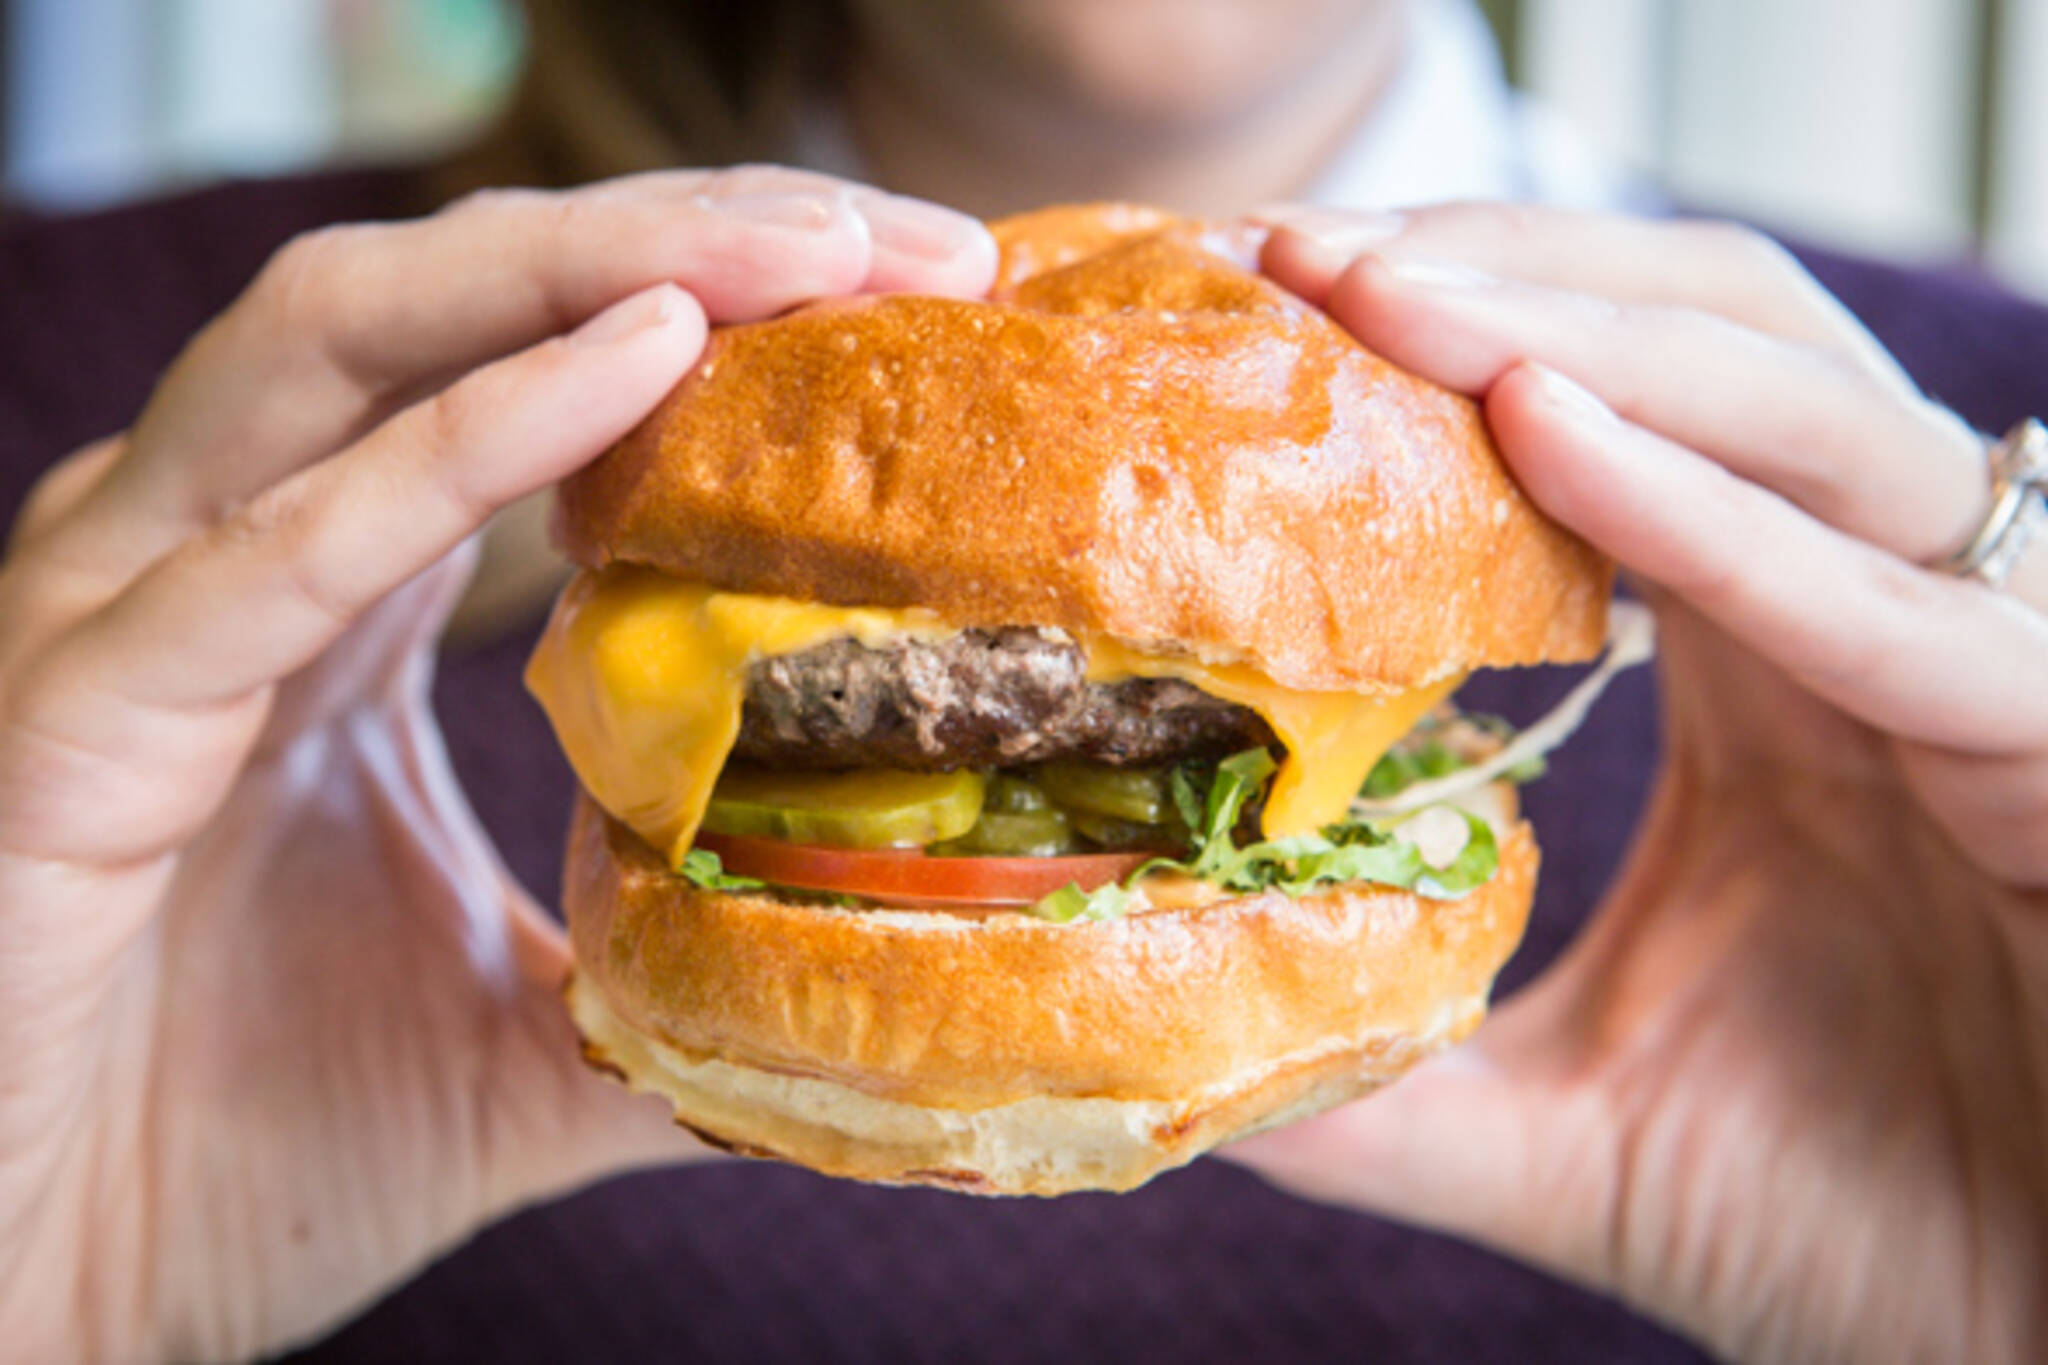 wahlburgers toronto